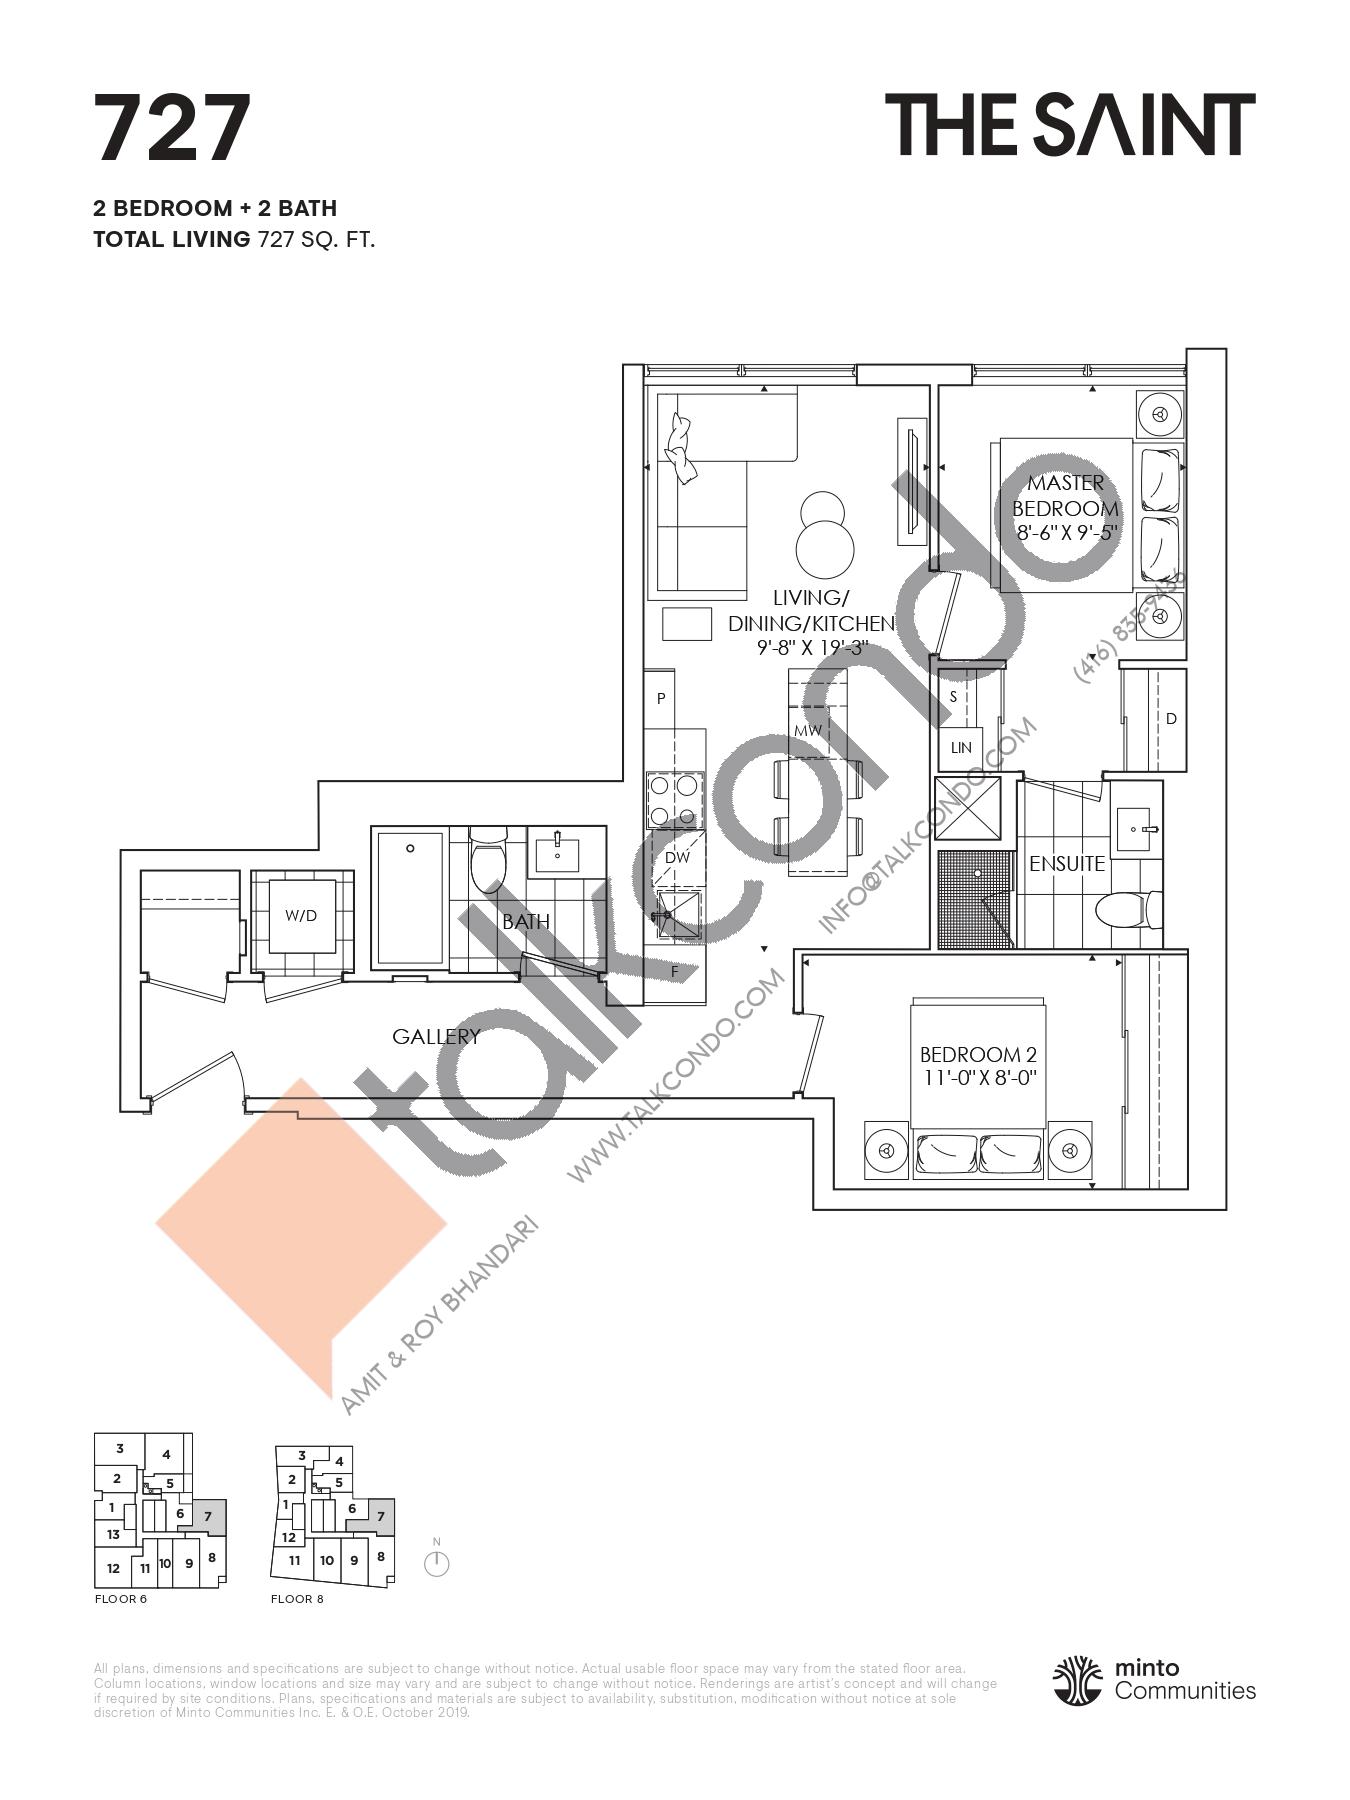 727 Floor Plan at The Saint Condos - 727 sq.ft